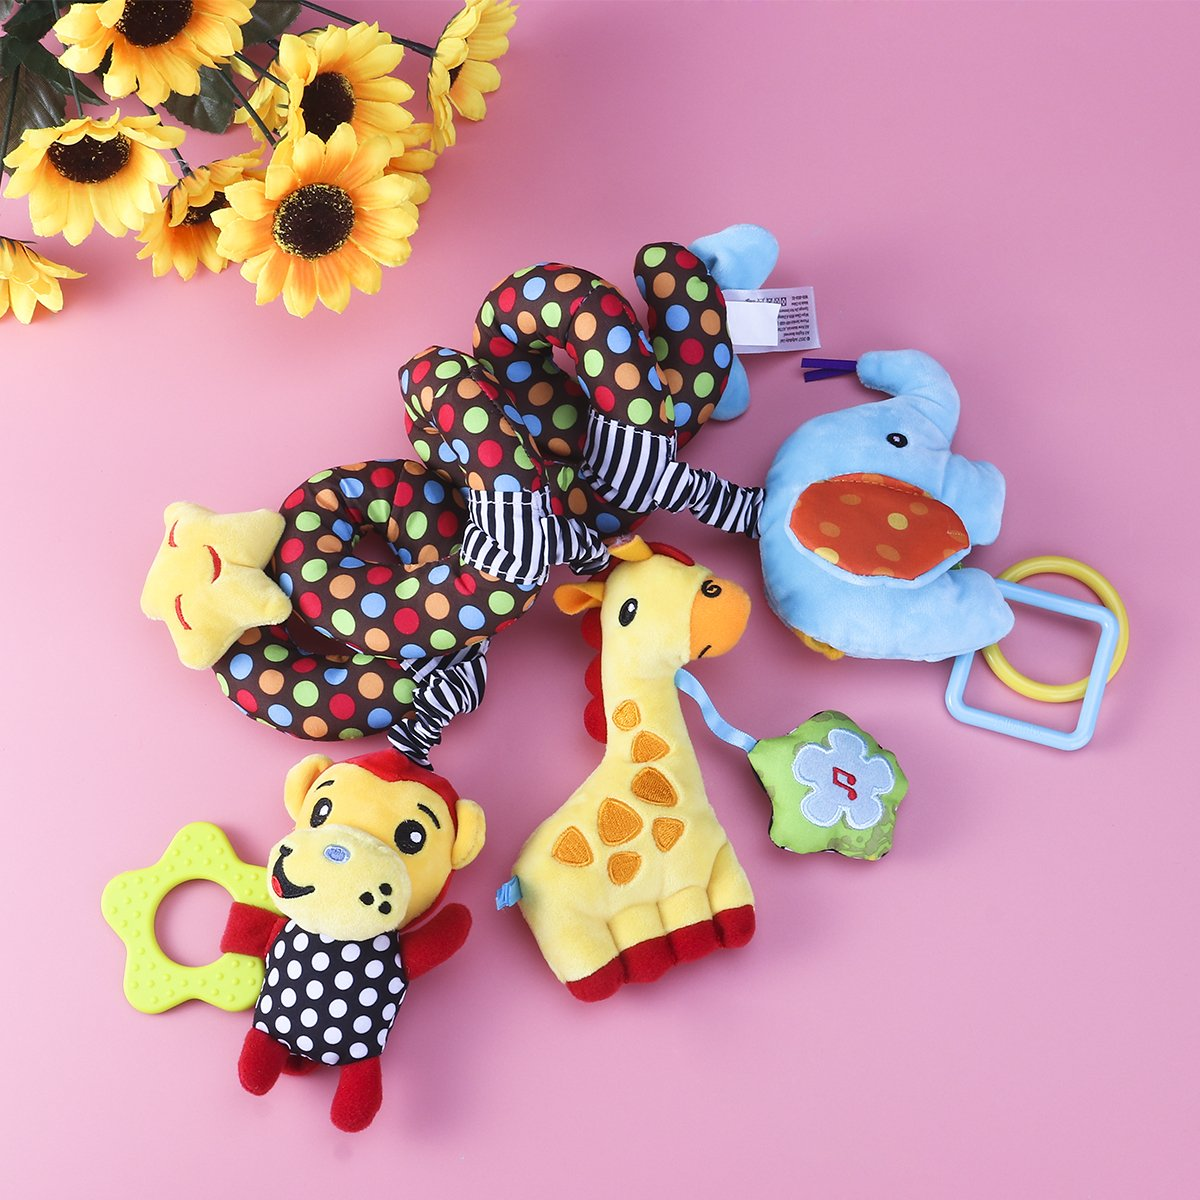 TOYMYTOY Beb/é infantil actividad espiral cama cochecito juguete mono elefante peluche juguete educativo